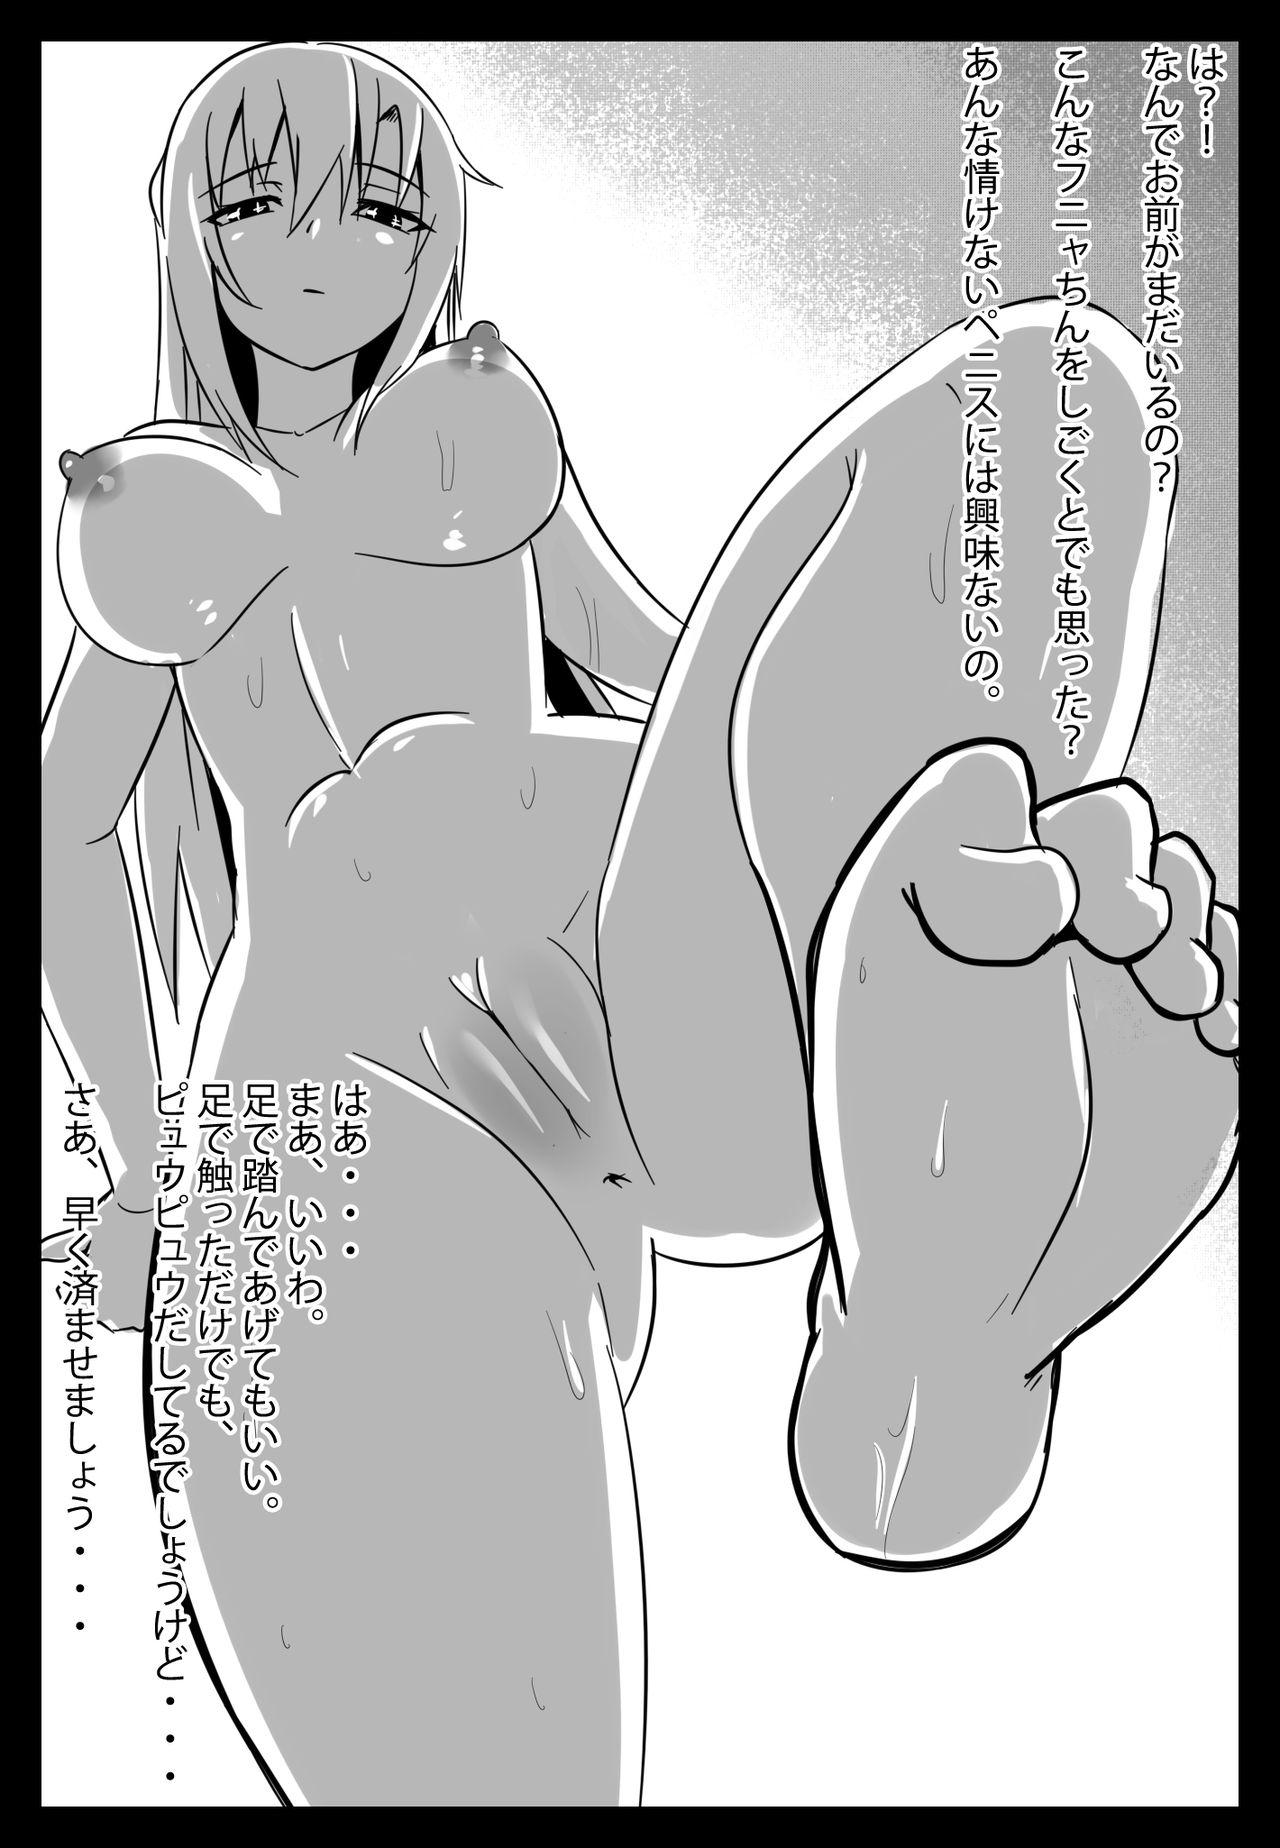 [Merkonig] B-Trayal 19-2 (Sword Art Online) 15